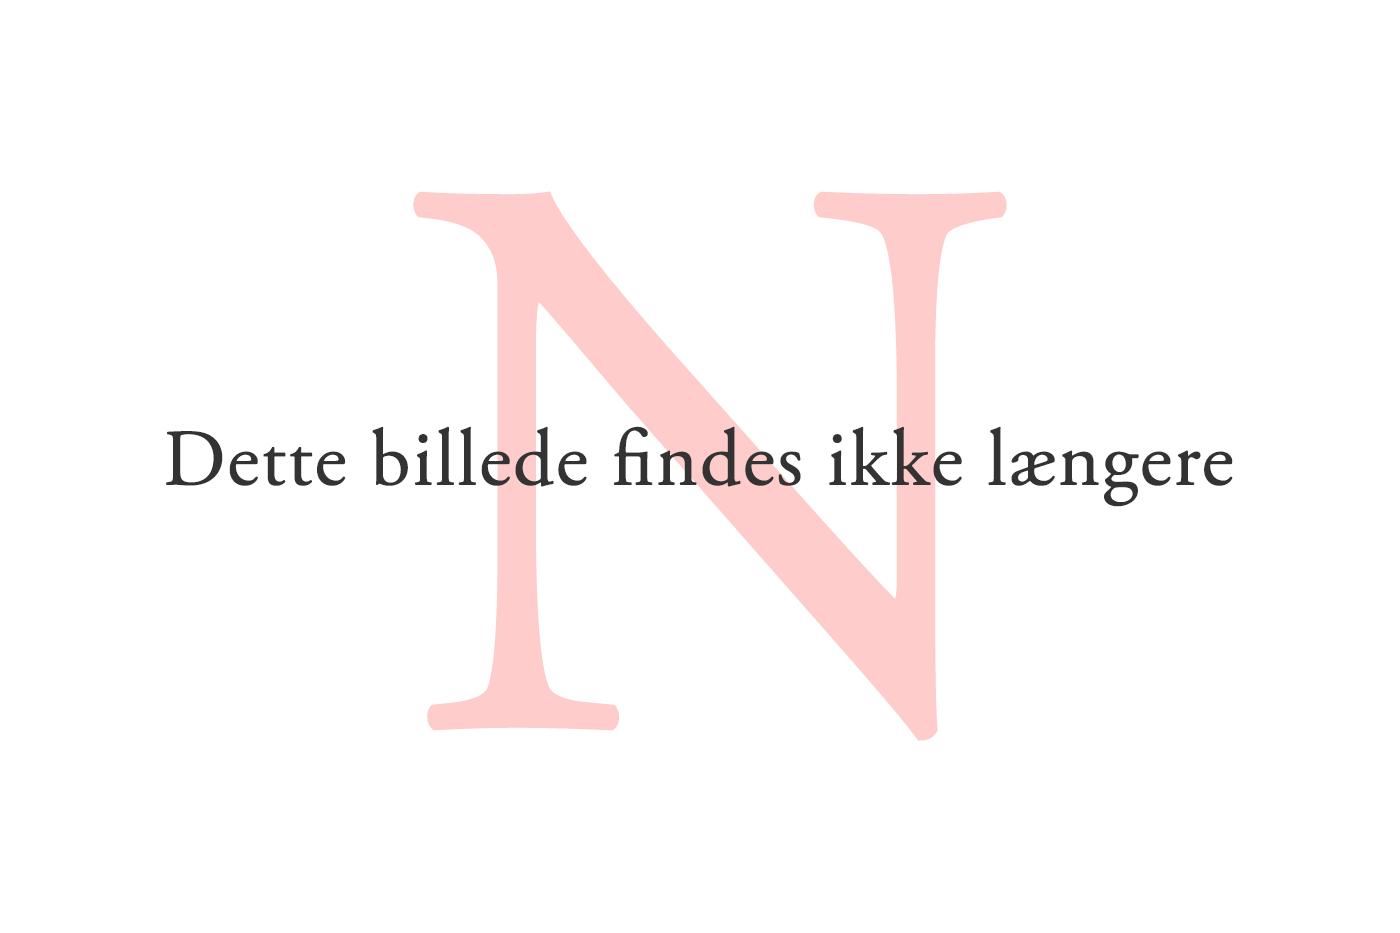 shemale danmark intim massage nordsjælland